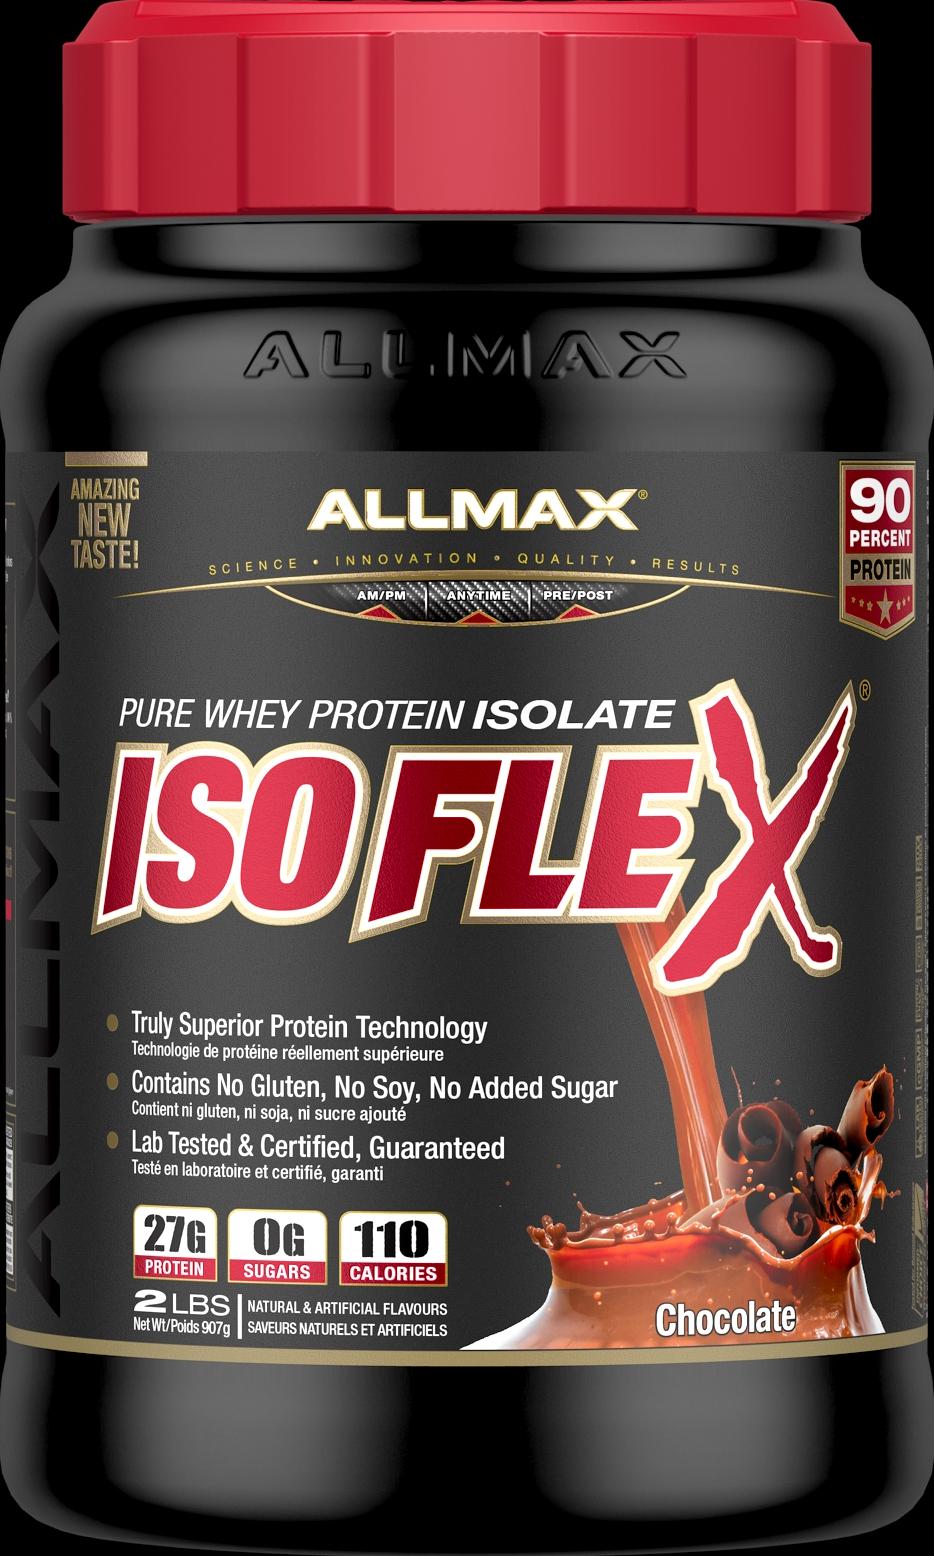 Allmax Nutrition Allmax - Isoflex - Whey Protein Isolate - Chocolate - 2lbs